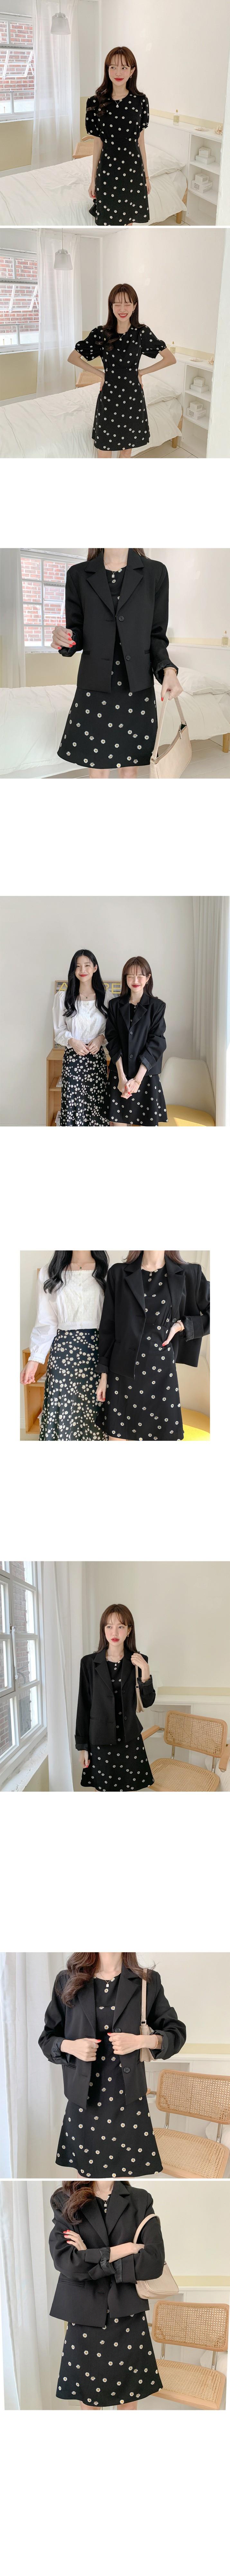 KHG0568X Dress